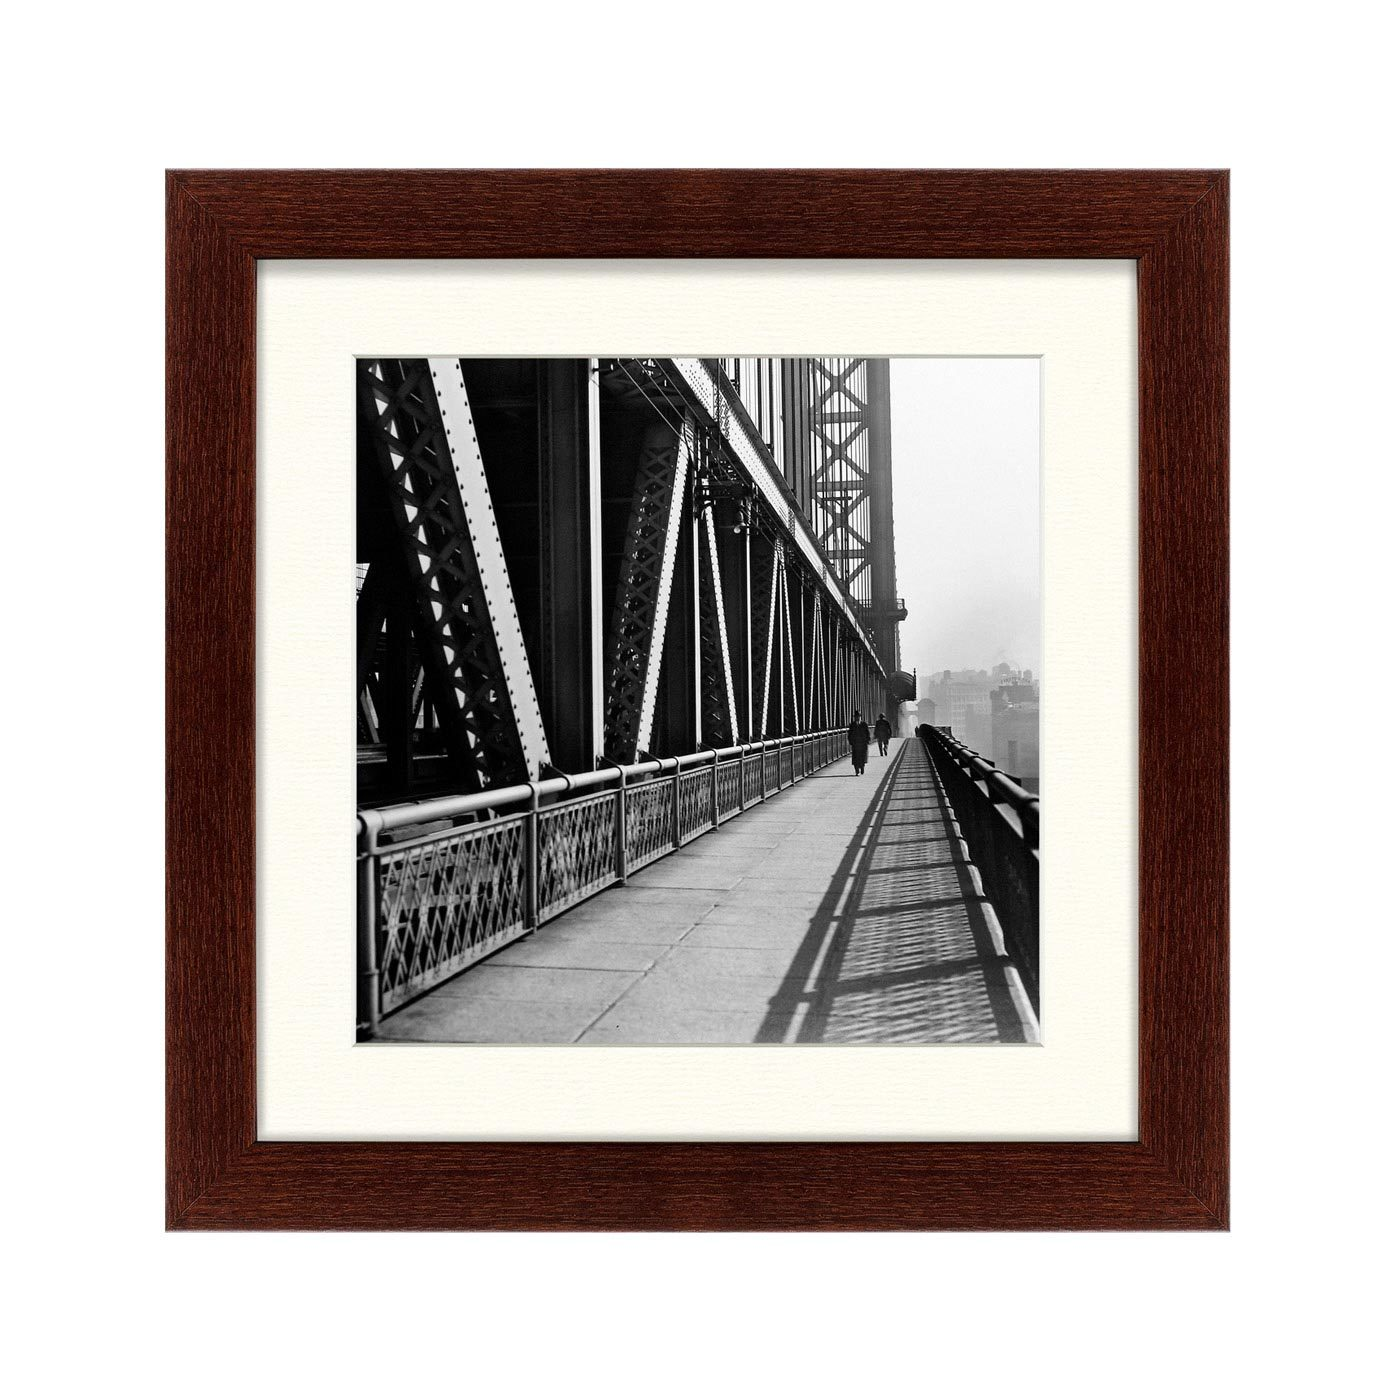 {} Картины в Квартиру Картина Манхэттенский Мост (35х35 см) картины в квартиру картина каллы 2 35х35 см